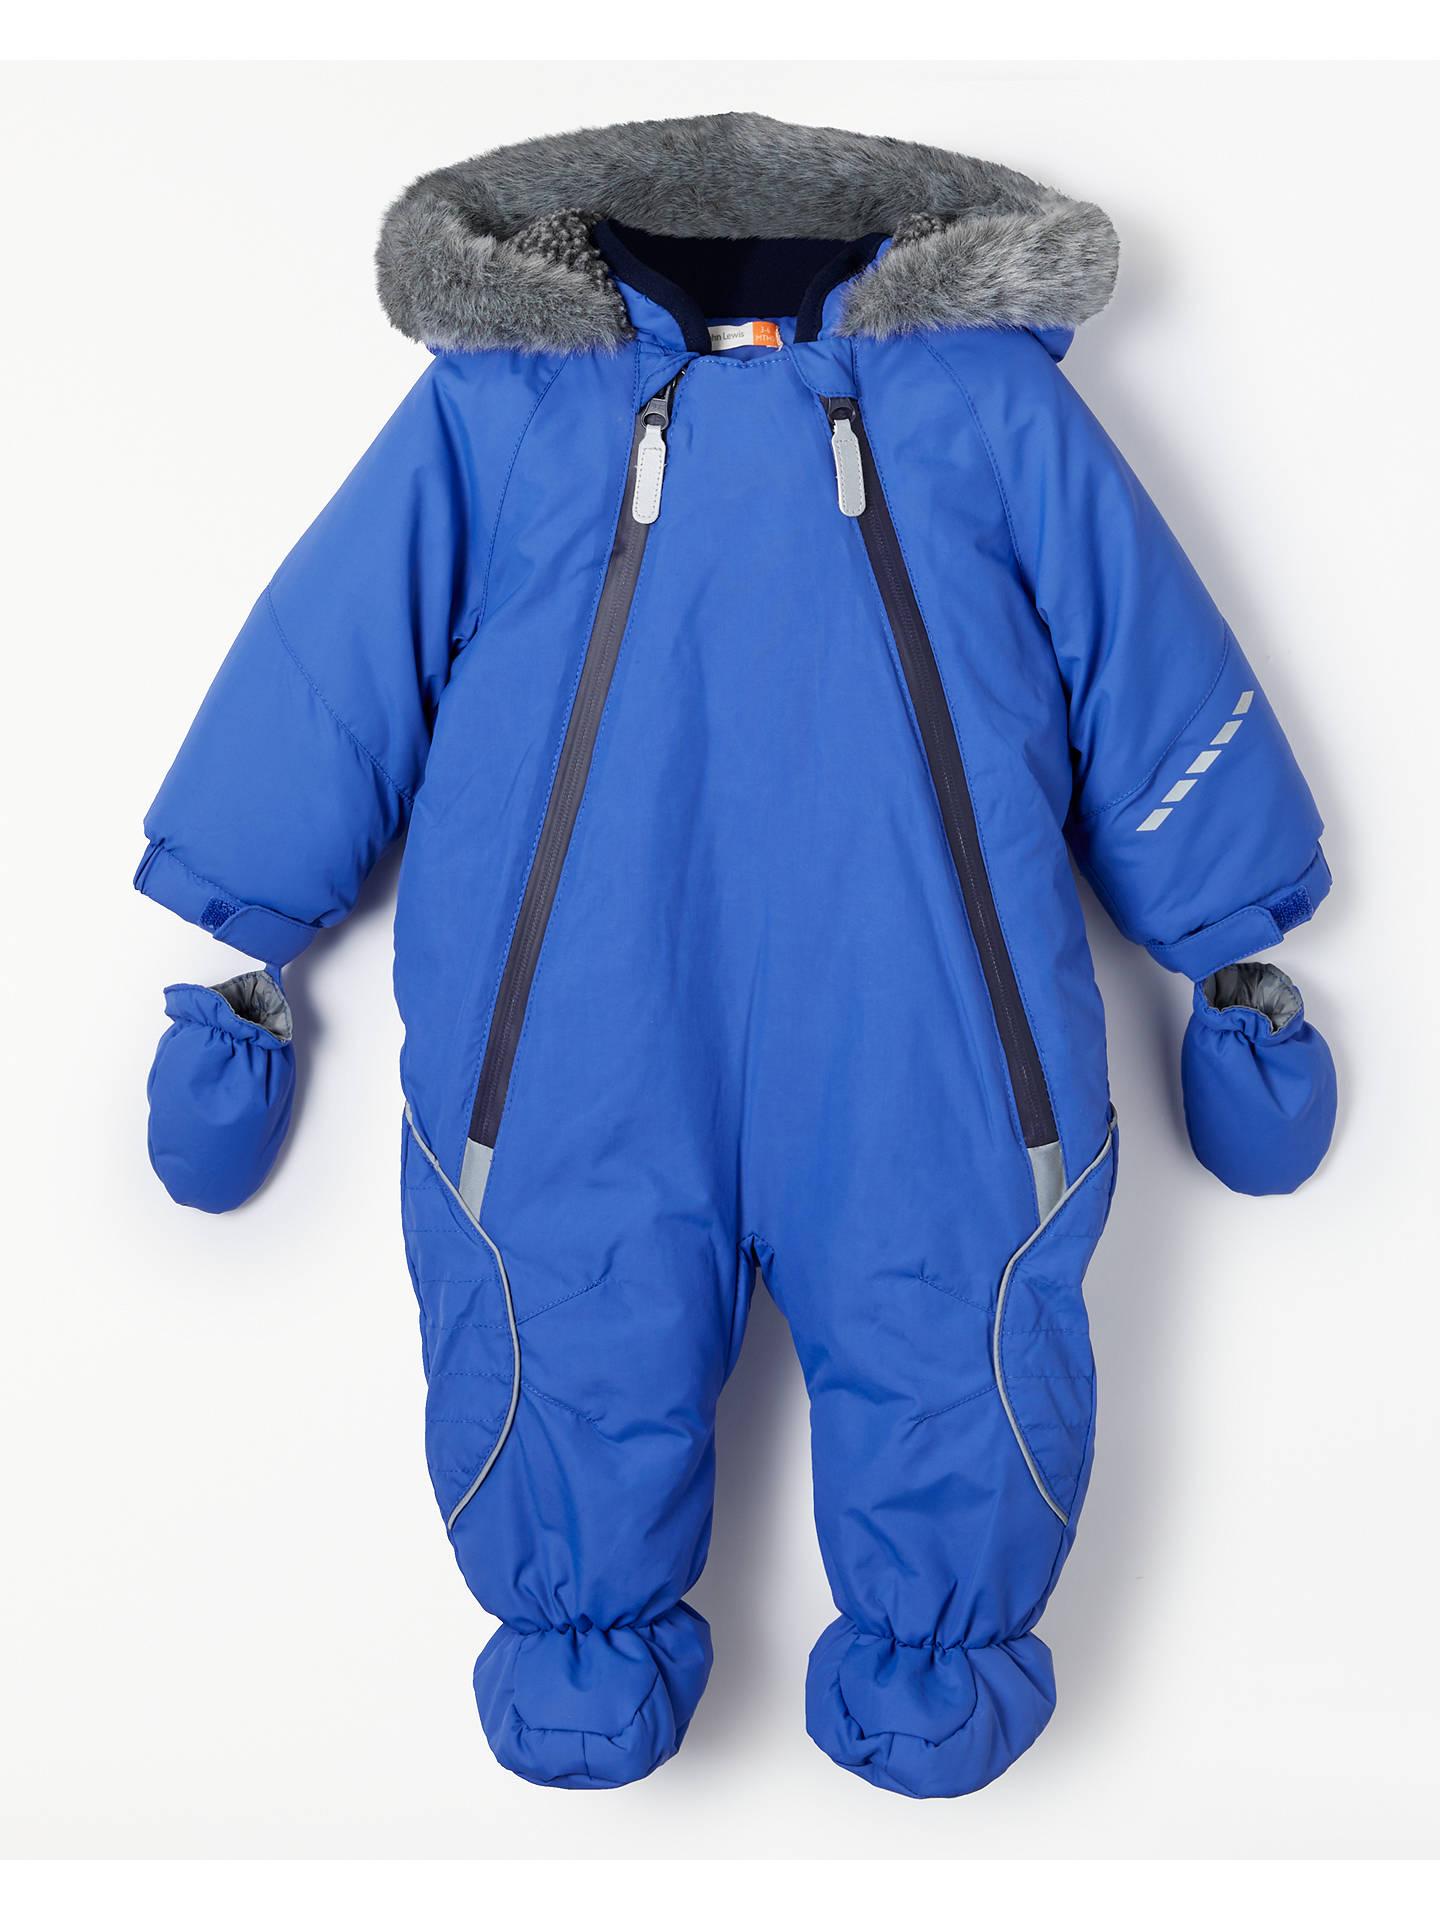 bbb02eb7ed Buy John Lewis   Partners Baby Reflective Snowsuit